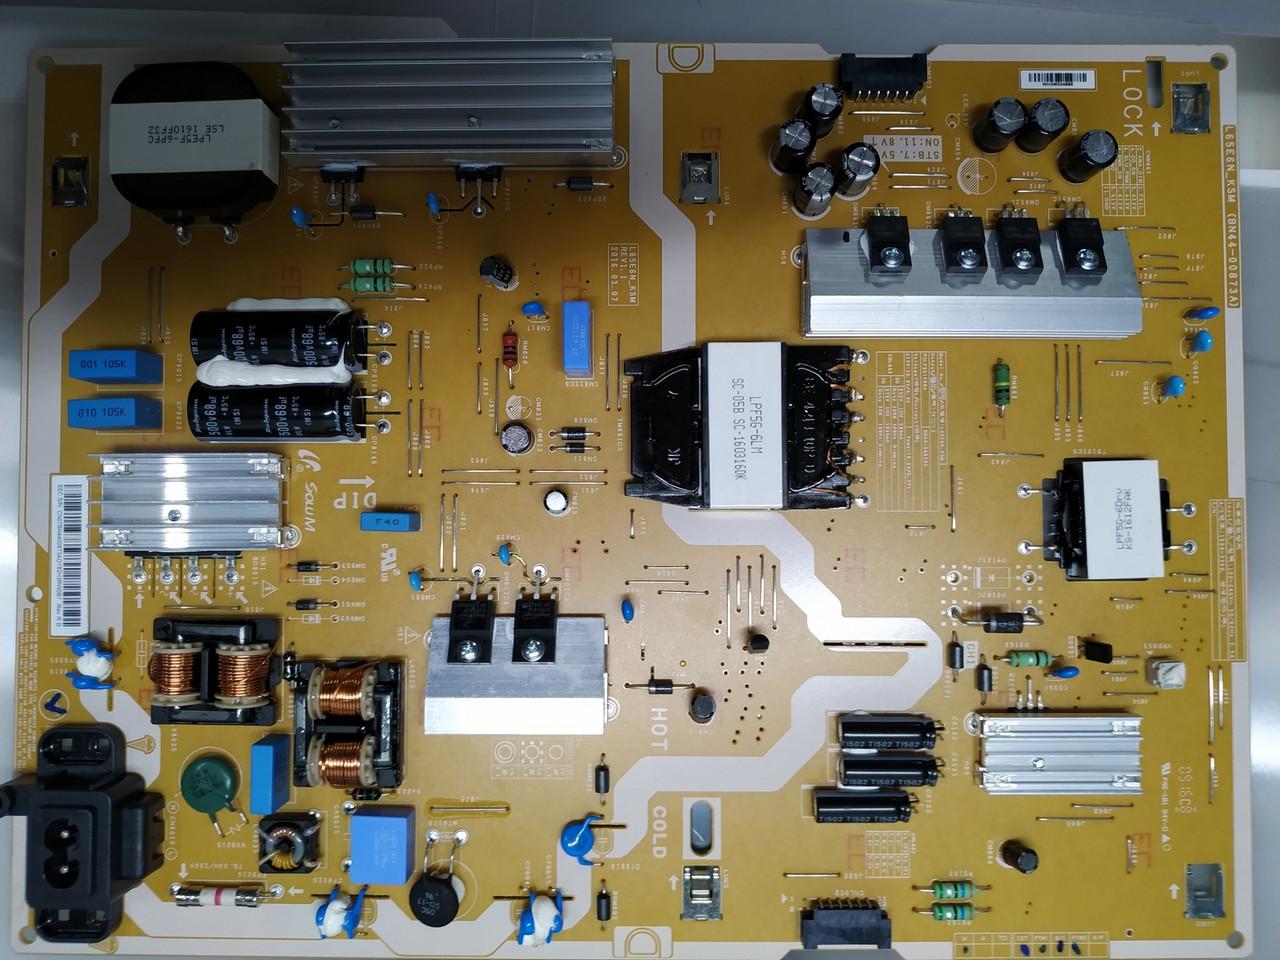 Блок Питания BN44-00873A (Rev 1.1) L65E6N_KSM для телевизора Samsung UN65KU7500, UN65KU7000, UN65MU7500, UN65